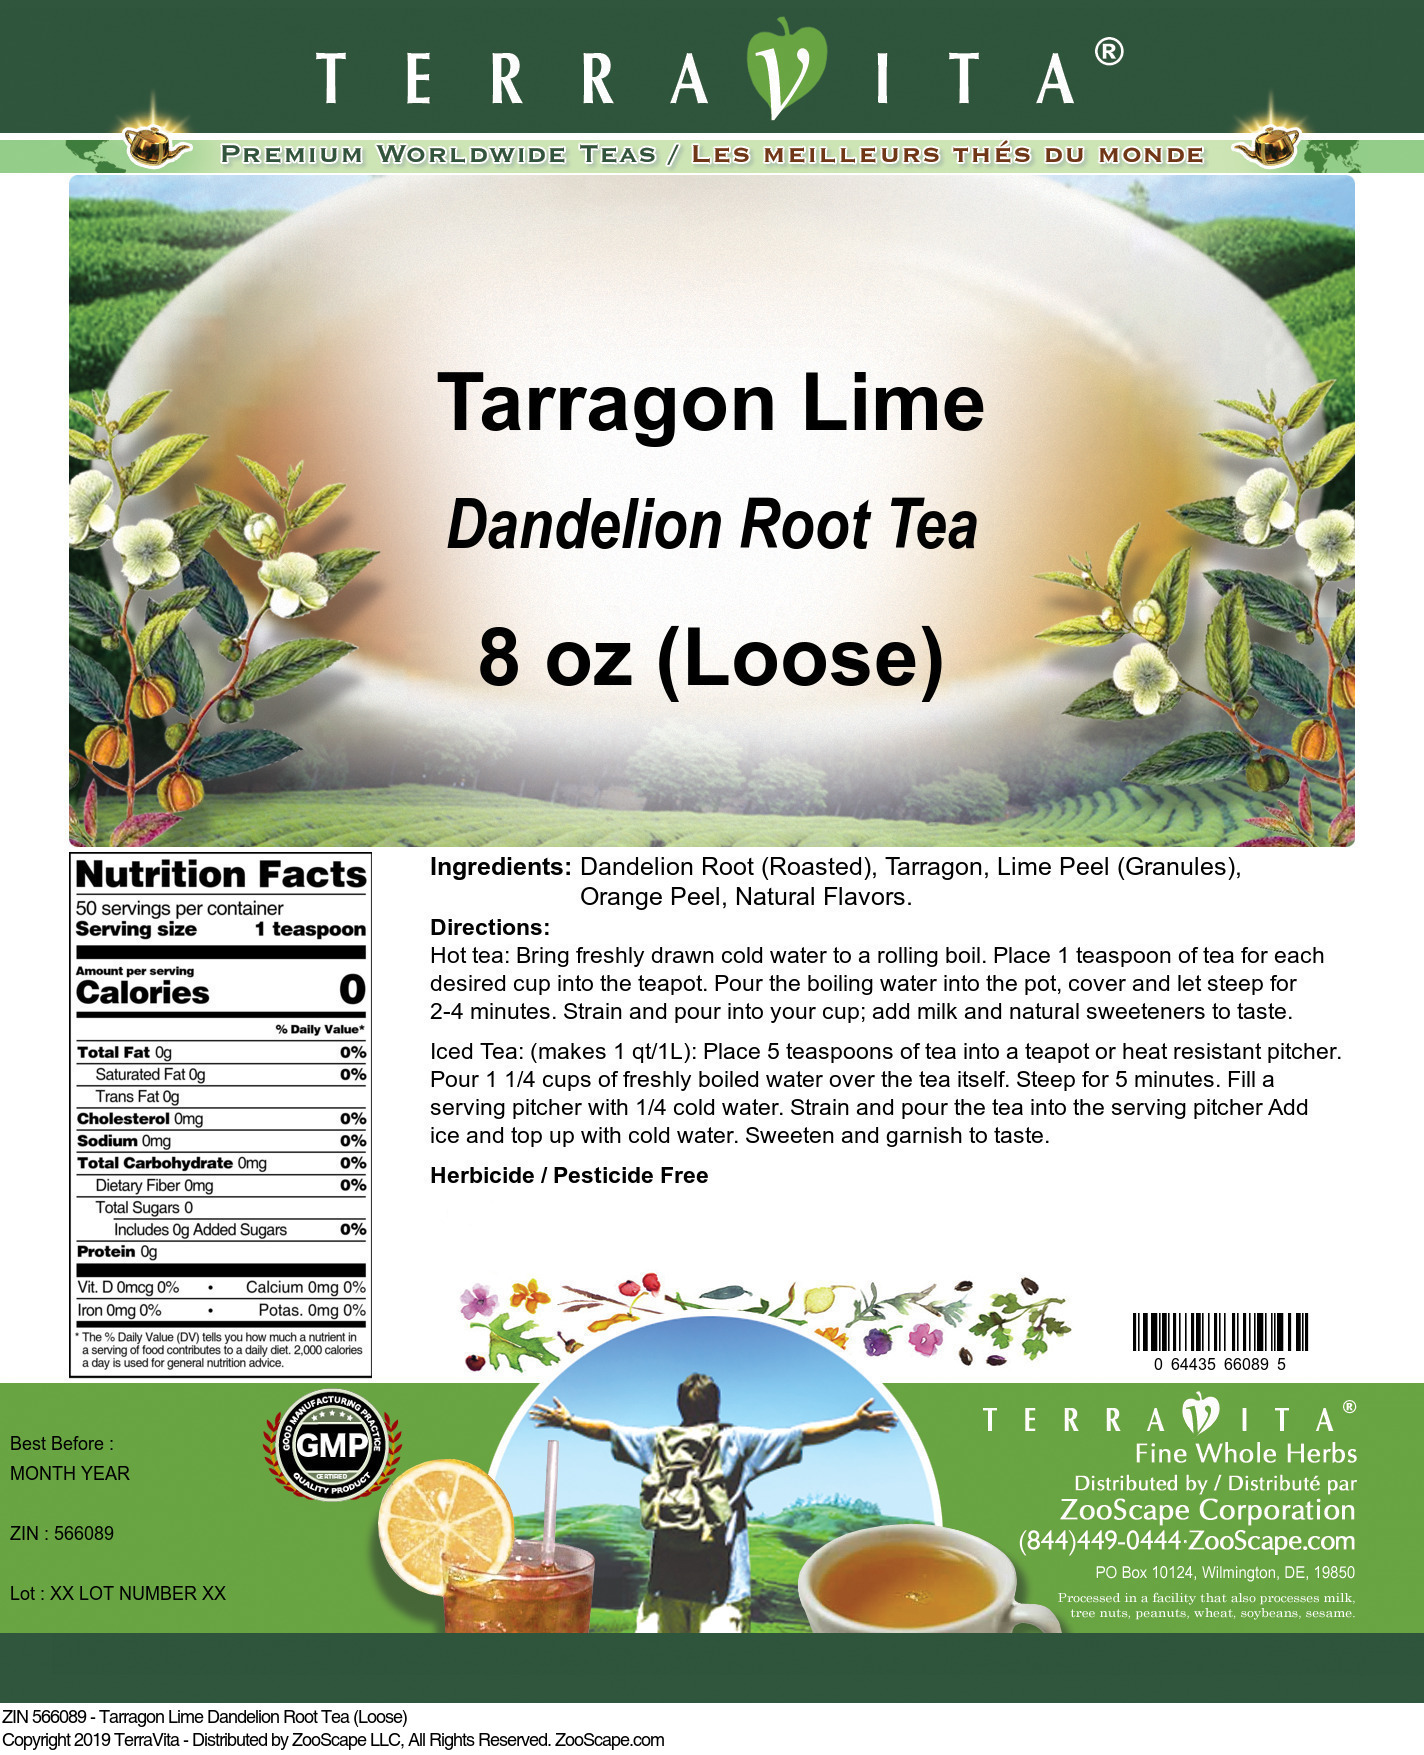 Tarragon Lime Dandelion Root Tea (Loose)